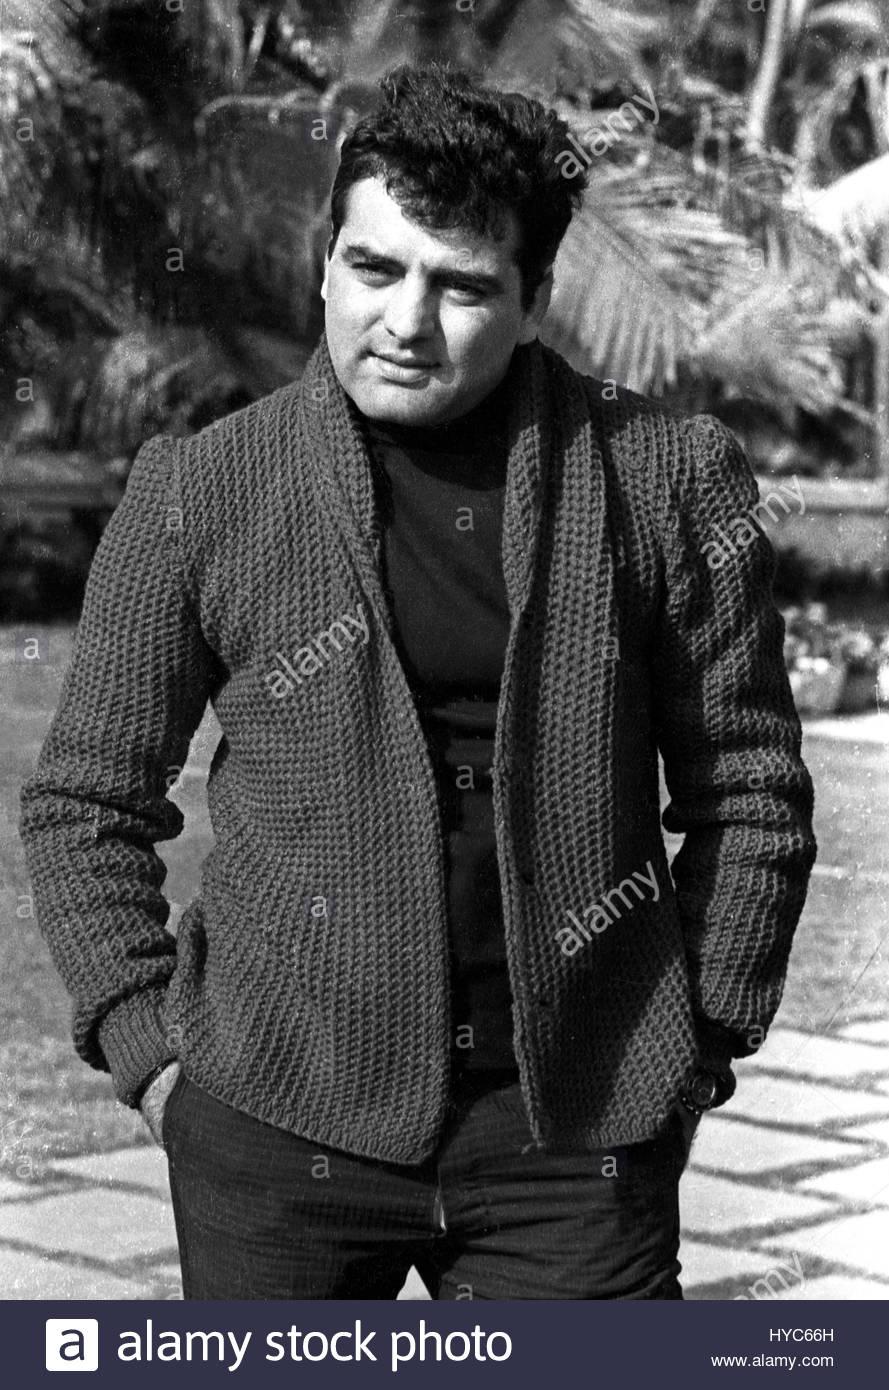 indian vintage 1900s bollywood actor feroz khan mumbai maharashtra hyc66h